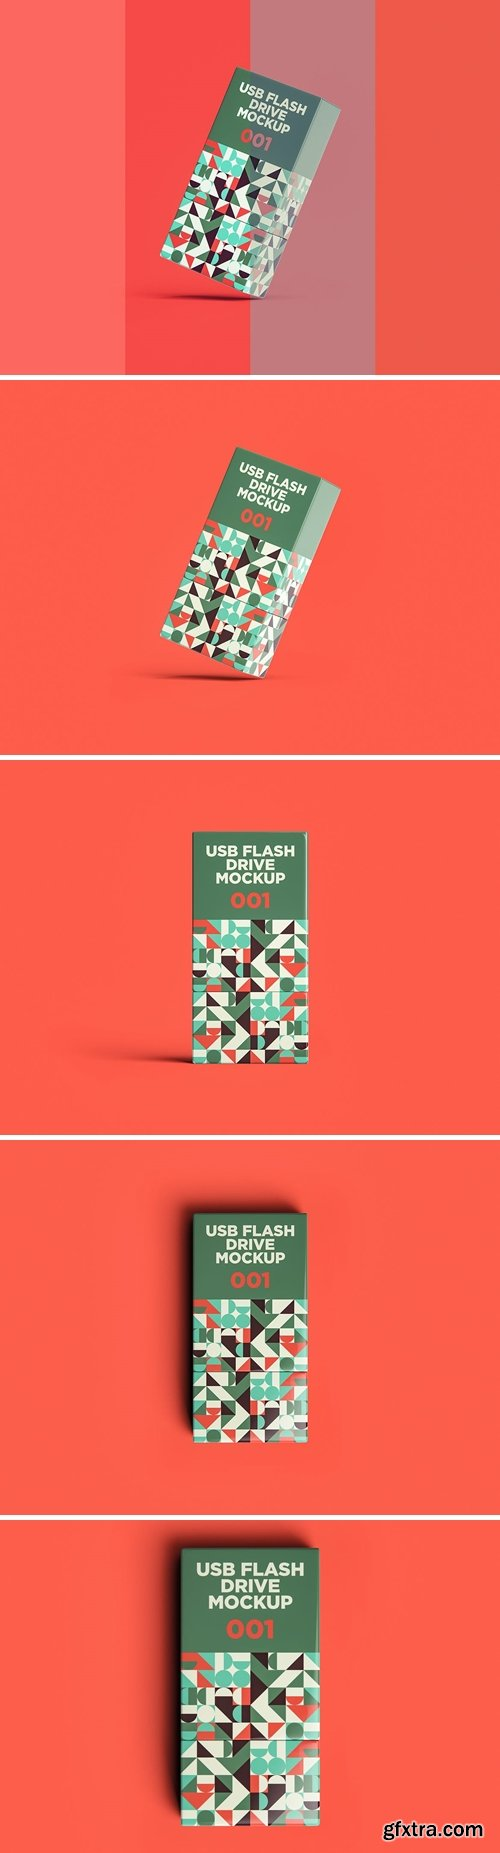 USB Flash Drive Mockup 001